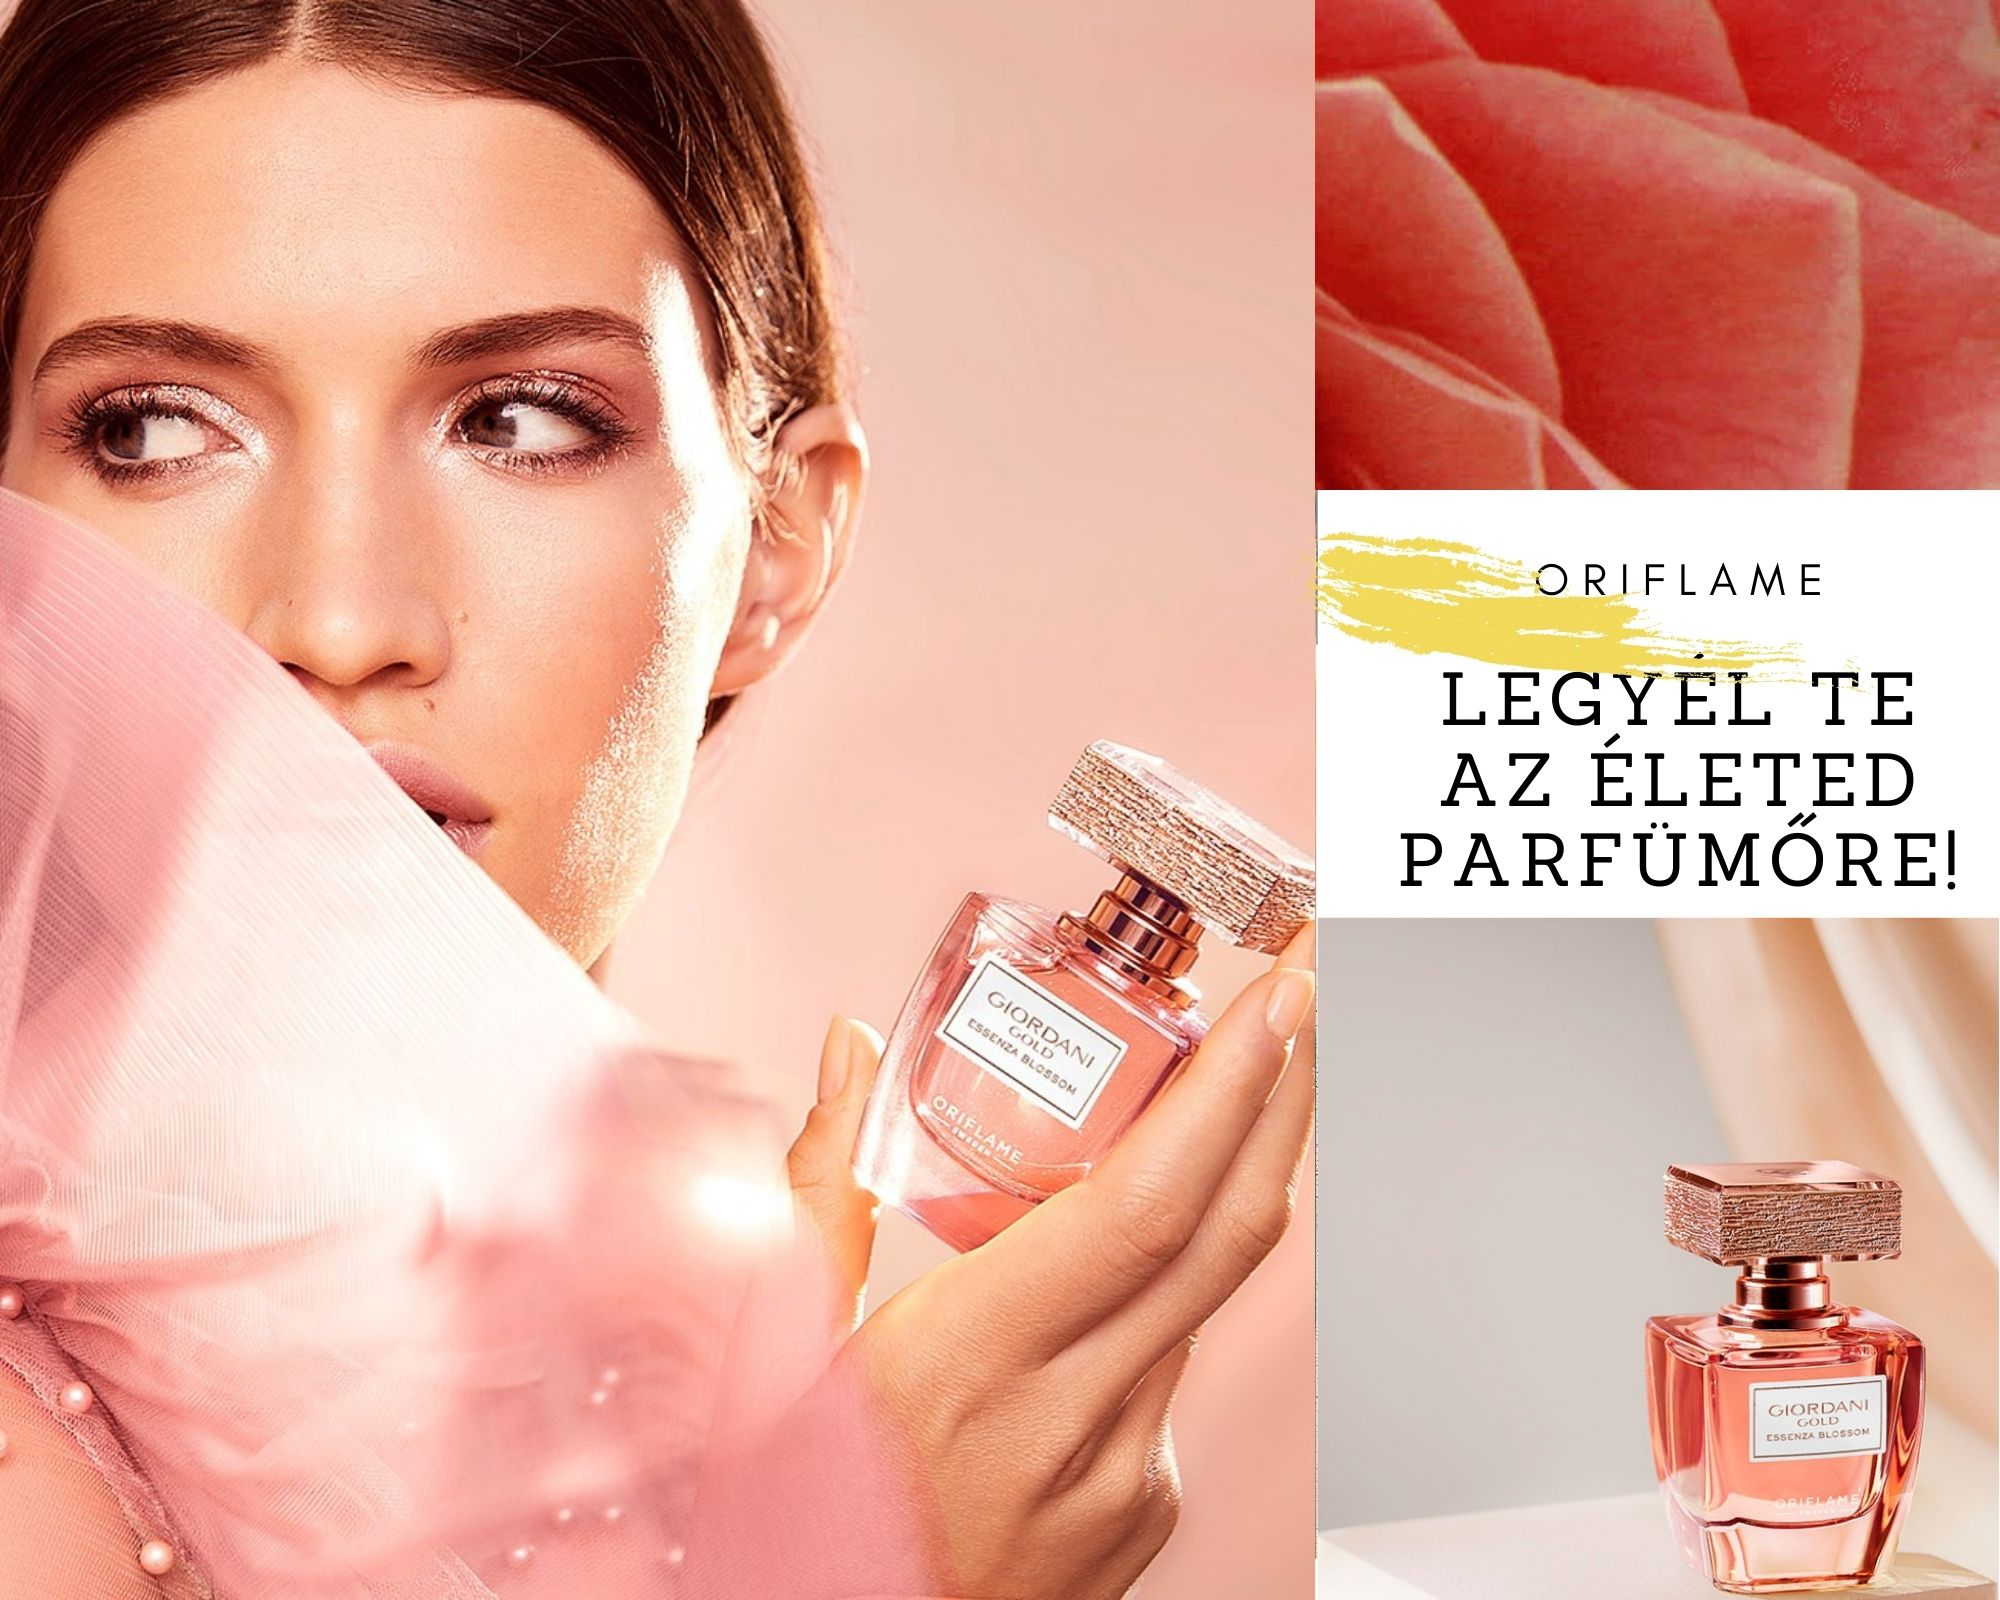 pastel_photo_sale_retail_stores_photo_collage_1.jpg